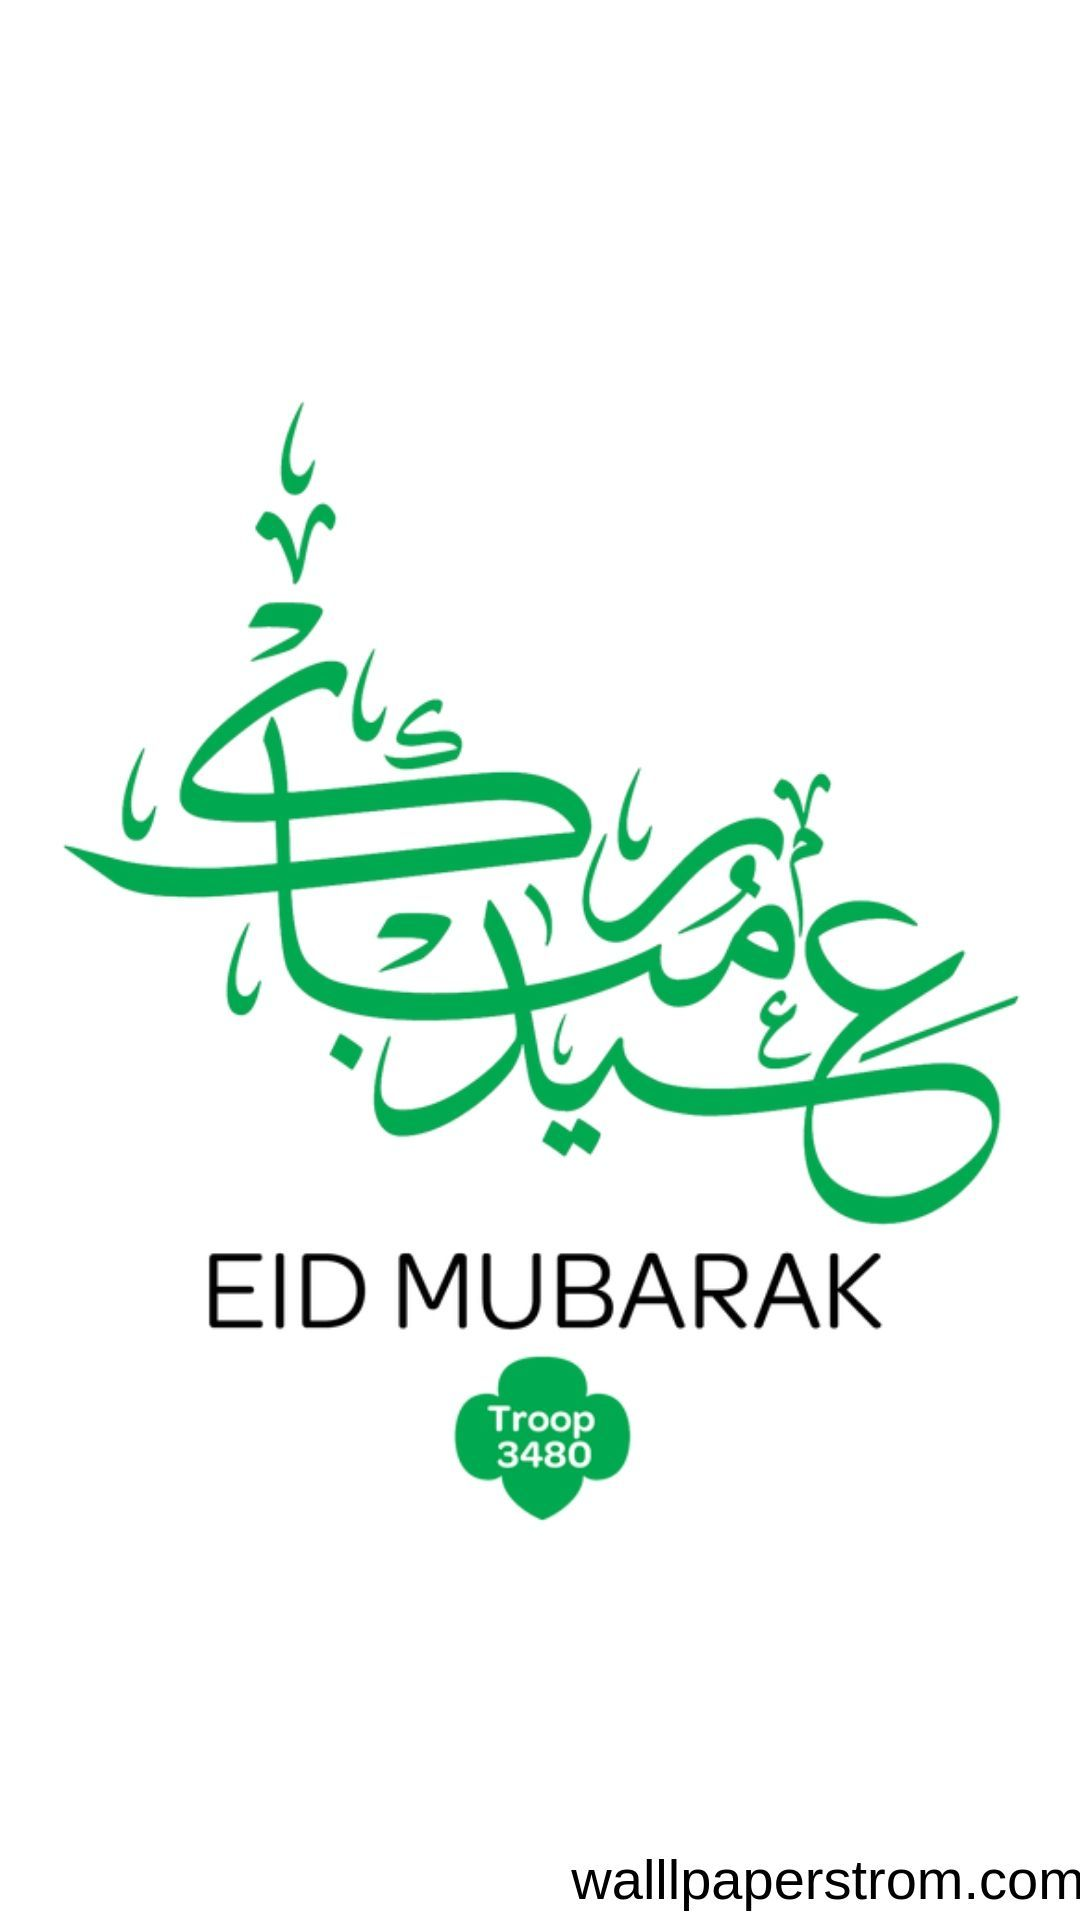 Eid Mubarak Wishes 2019 Images Hd Pics Photo Gallery Download Free Eid Mubarak Wishes Eid Mubarak Eid Mubarak Wishes Images